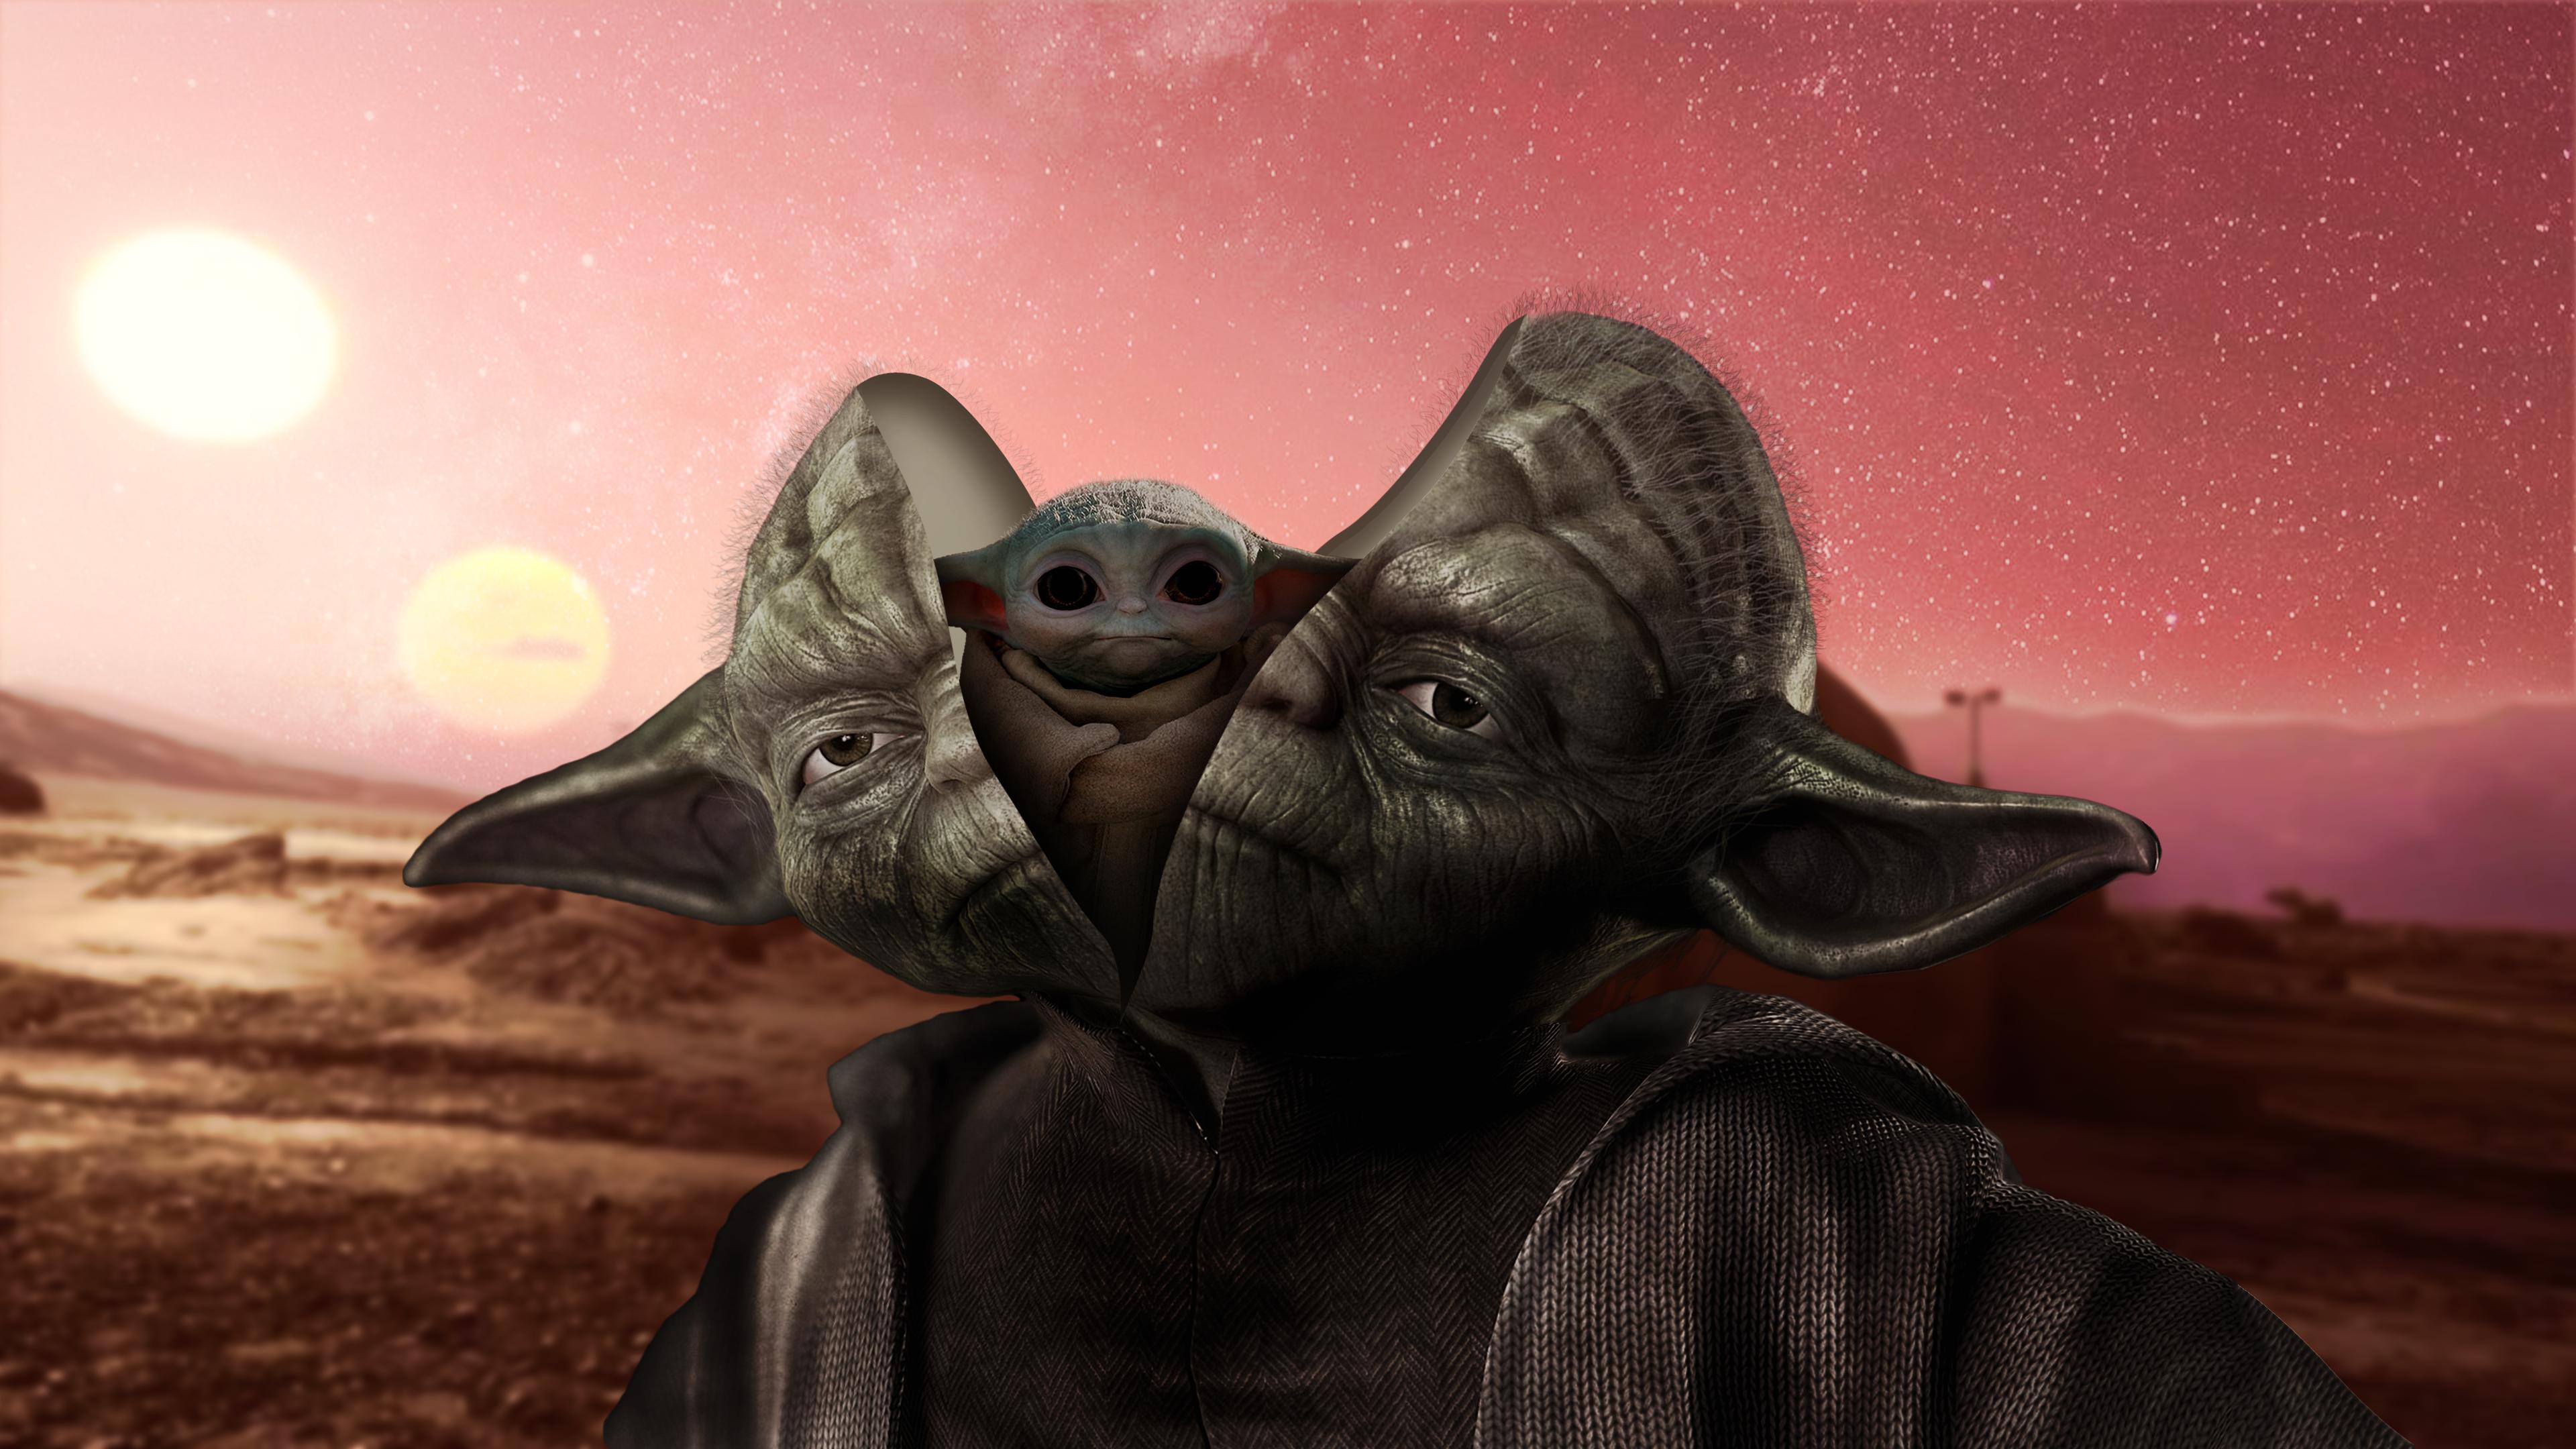 General 3840x2160 Yoda Baby Yoda Star Wars Tatooine transformation